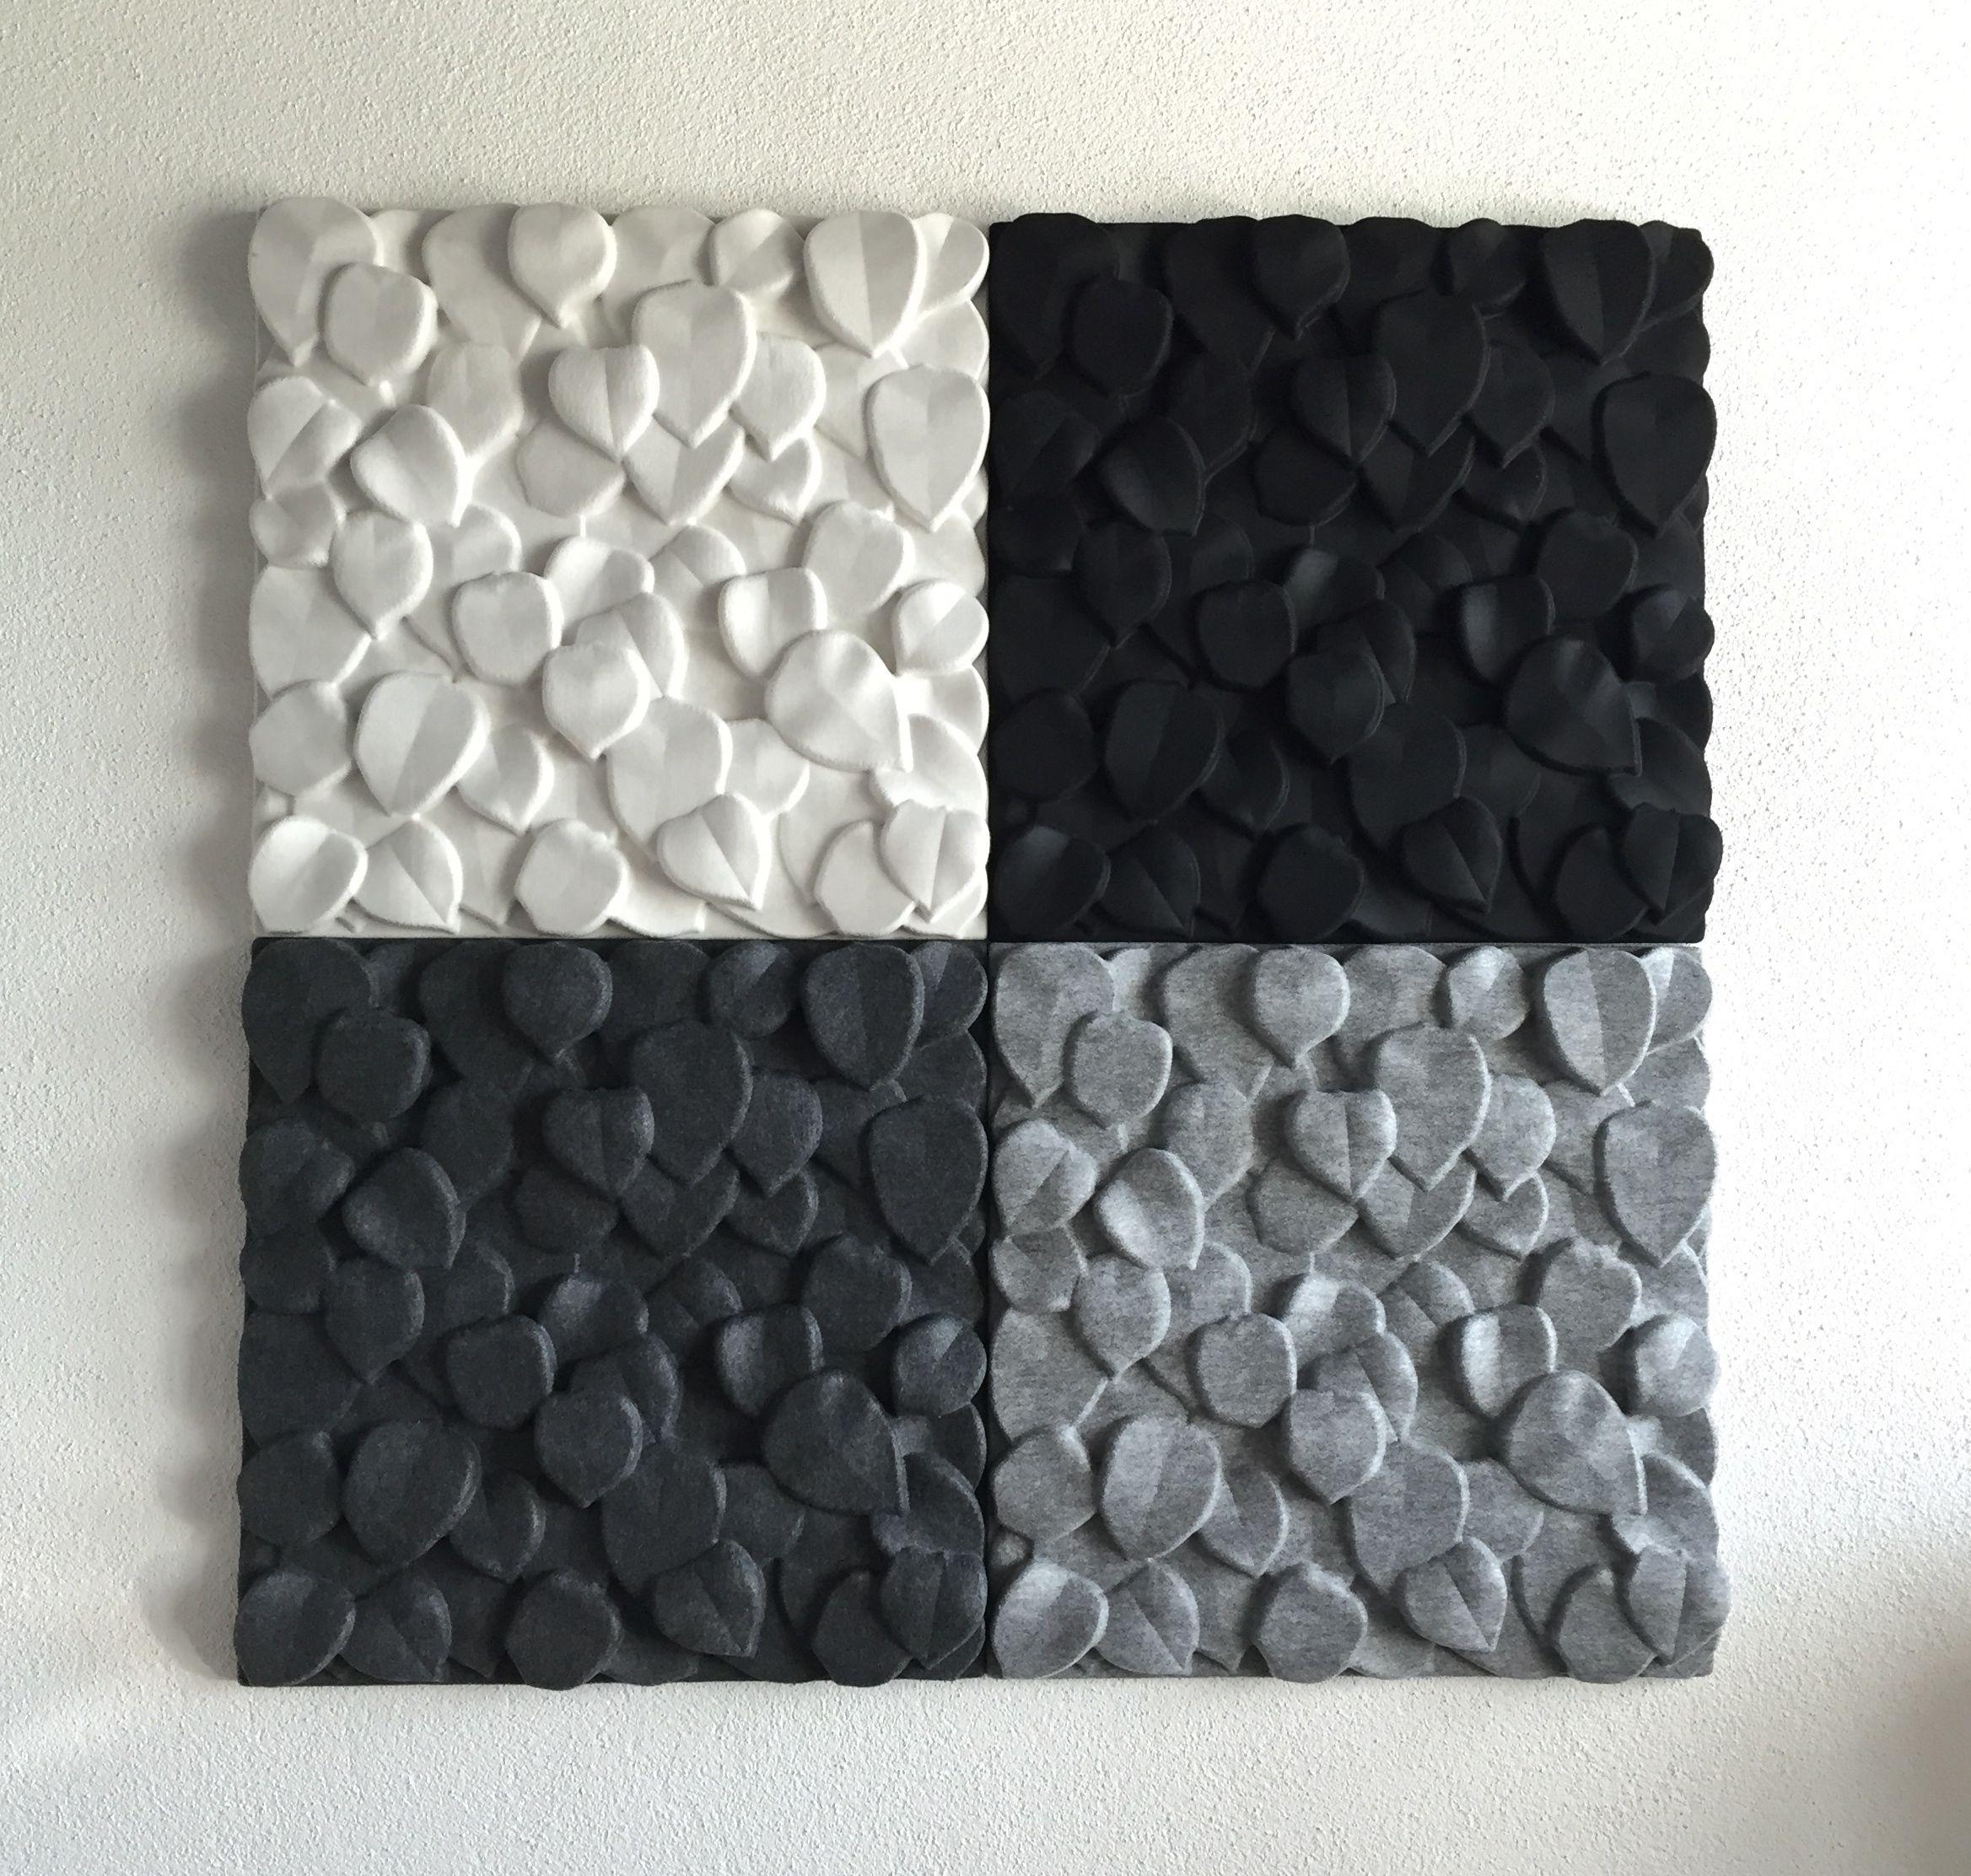 Trennwand Garage | Johanson Design - Schallabsorber «leaves ...